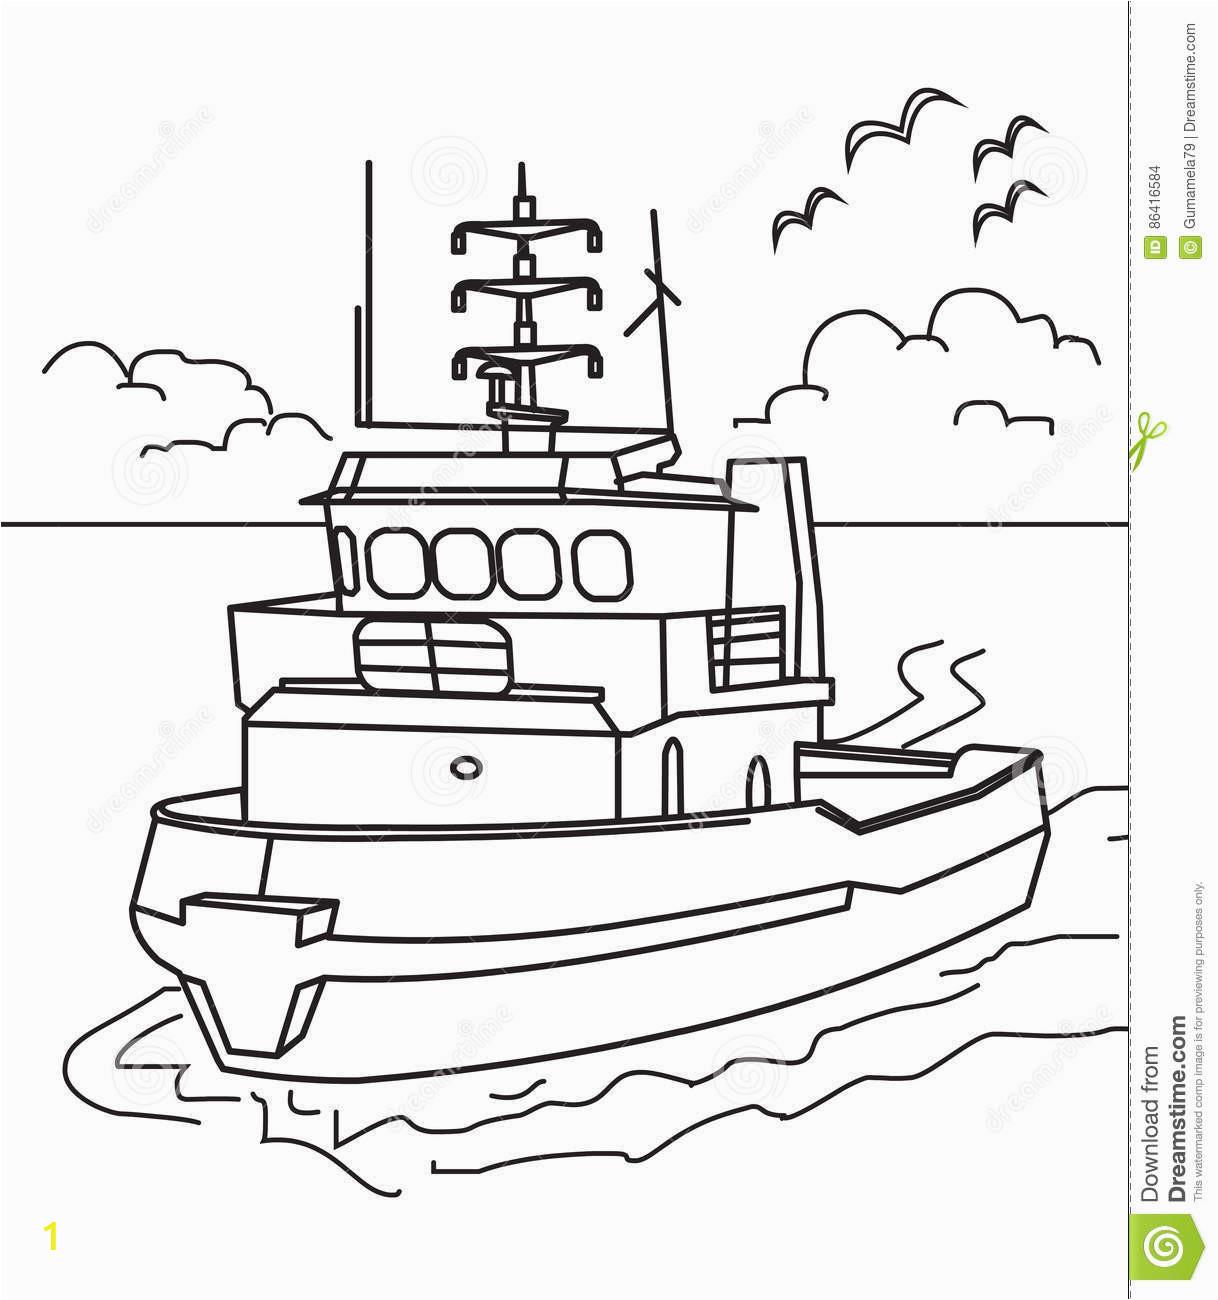 portfolio tugboat coloring page boat stock illustration of